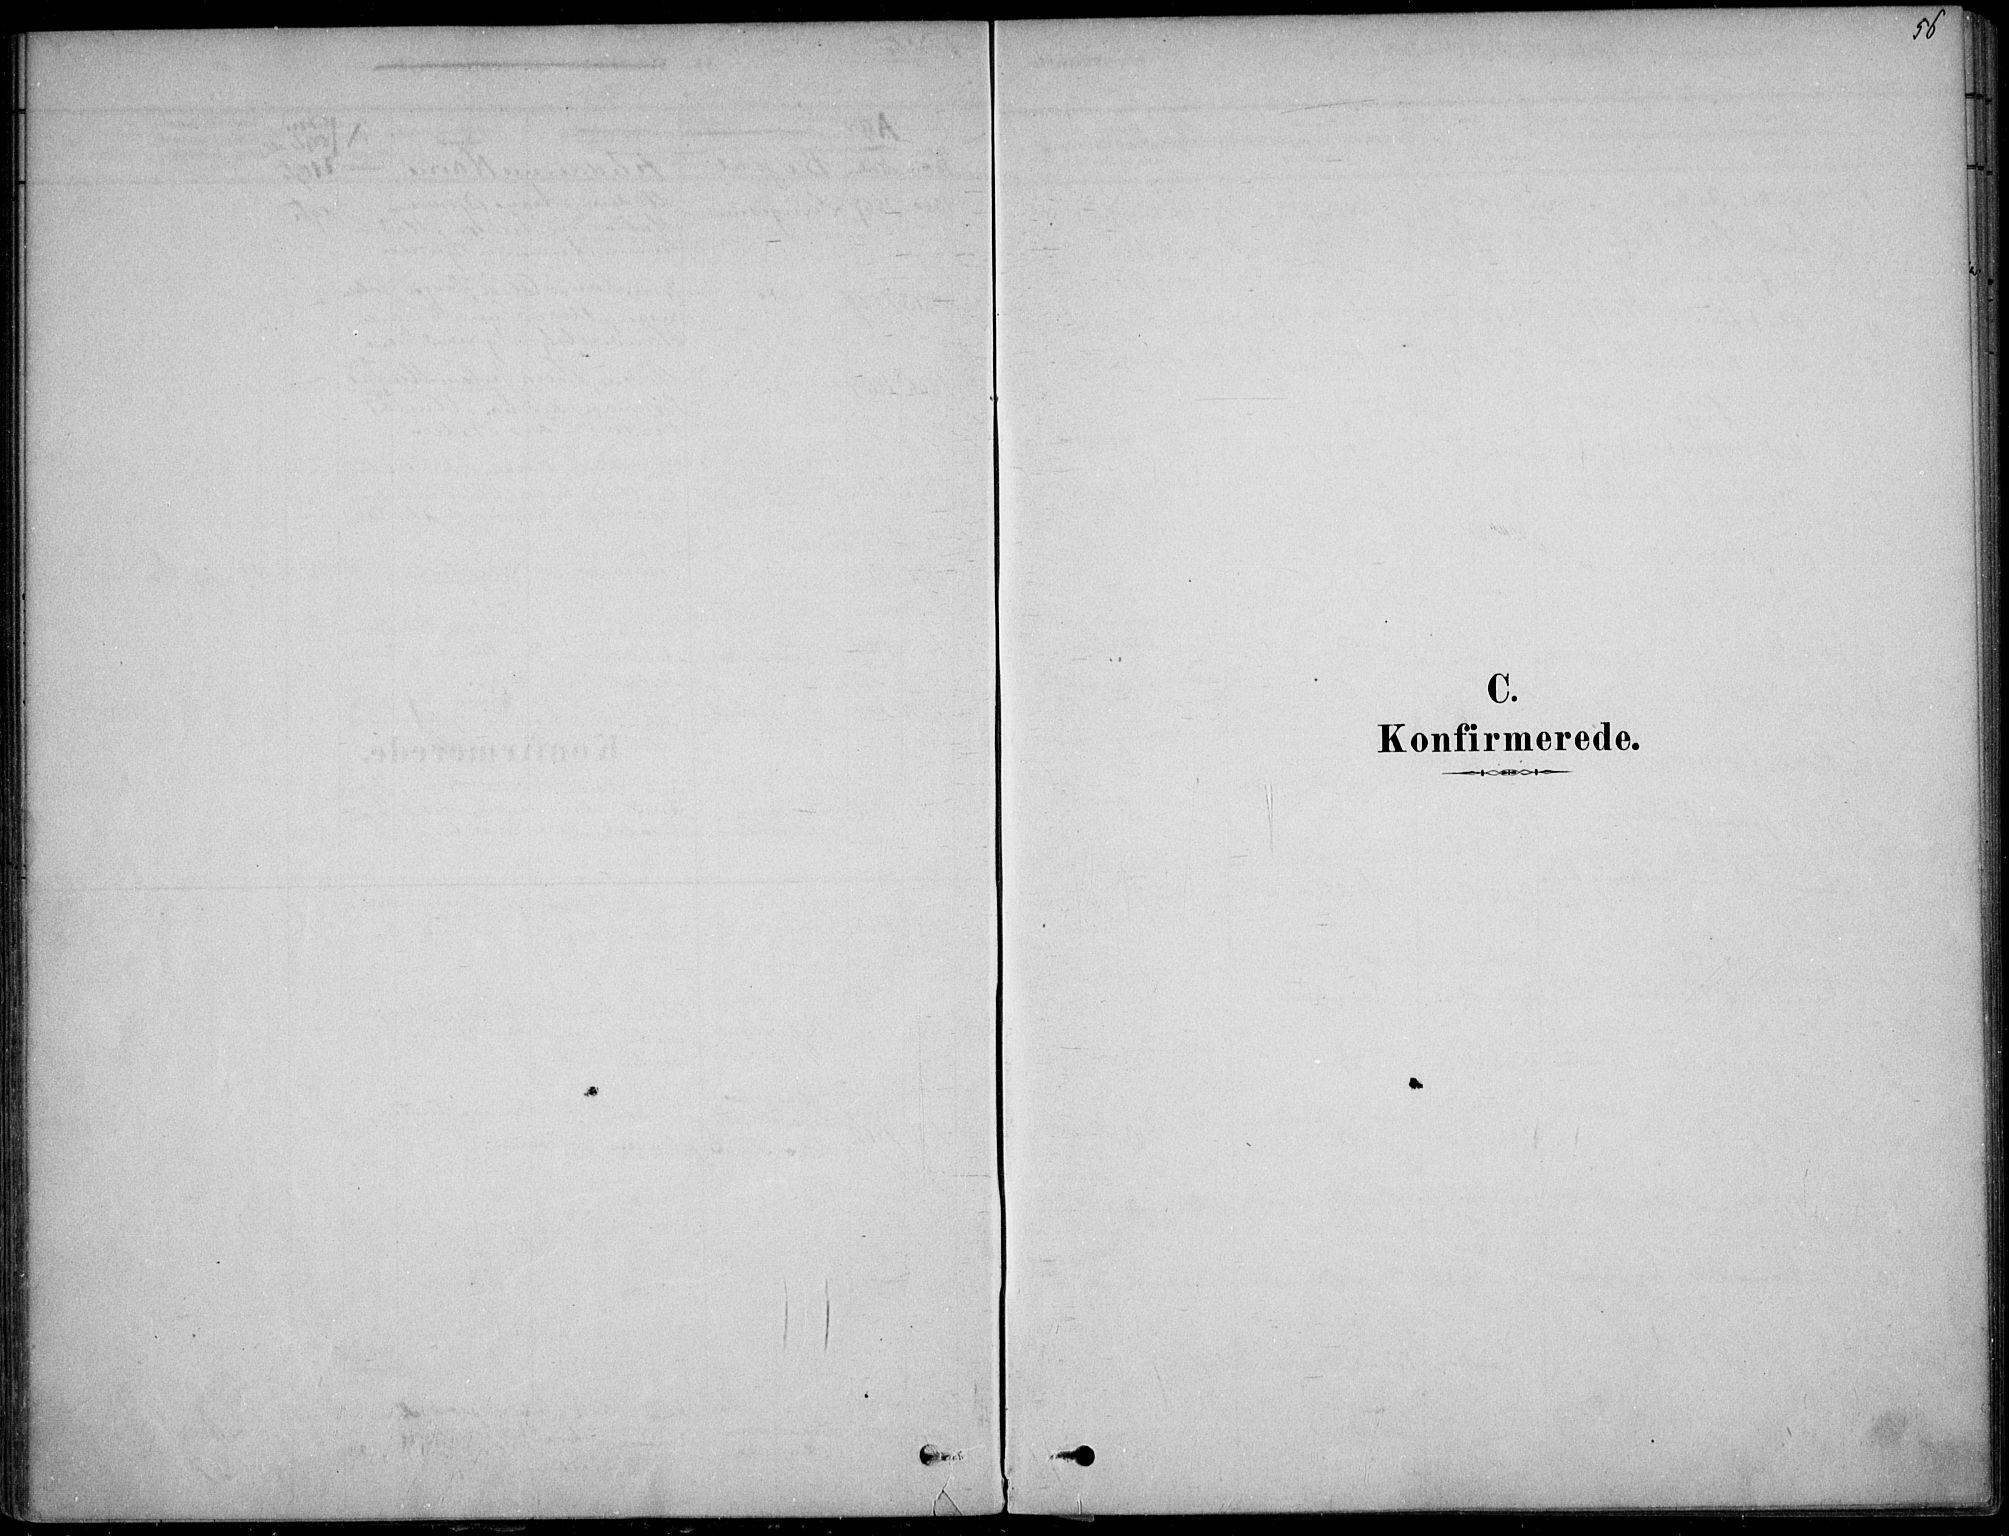 SAKO, Langesund kirkebøker, F/Fa/L0002: Ministerialbok nr. 2, 1878-1892, s. 56